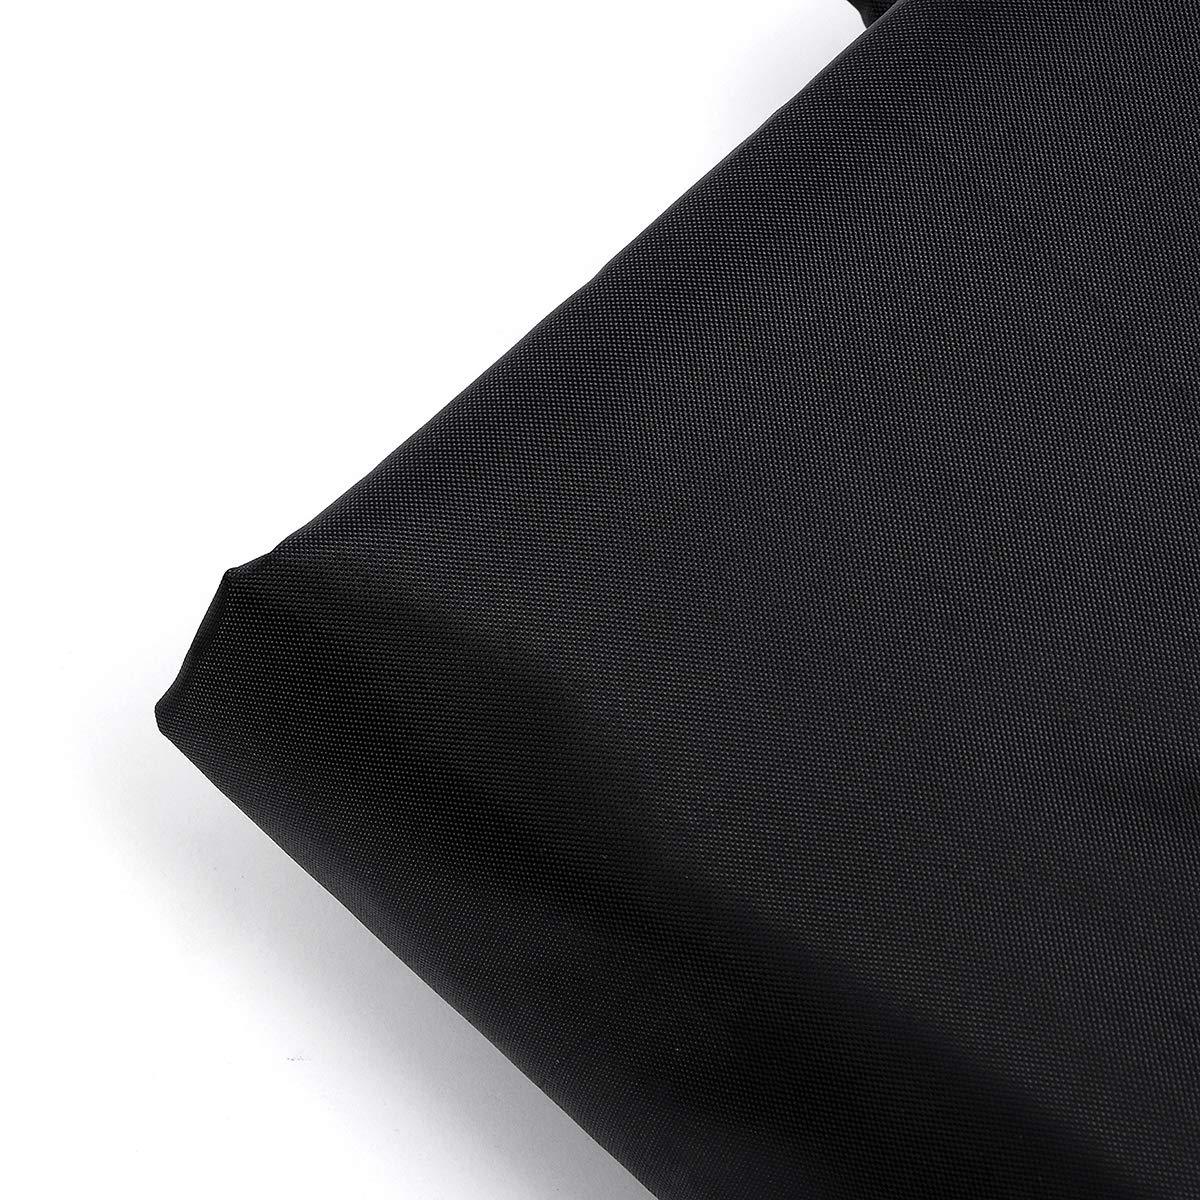 dDanke Black Left Hand L-Shaped Sofa Cover & Rectangular Table Cover Set for Outdoor Patio Waterproof & Dustproof Furniture Protection (2 Sizes Together) by dDanke